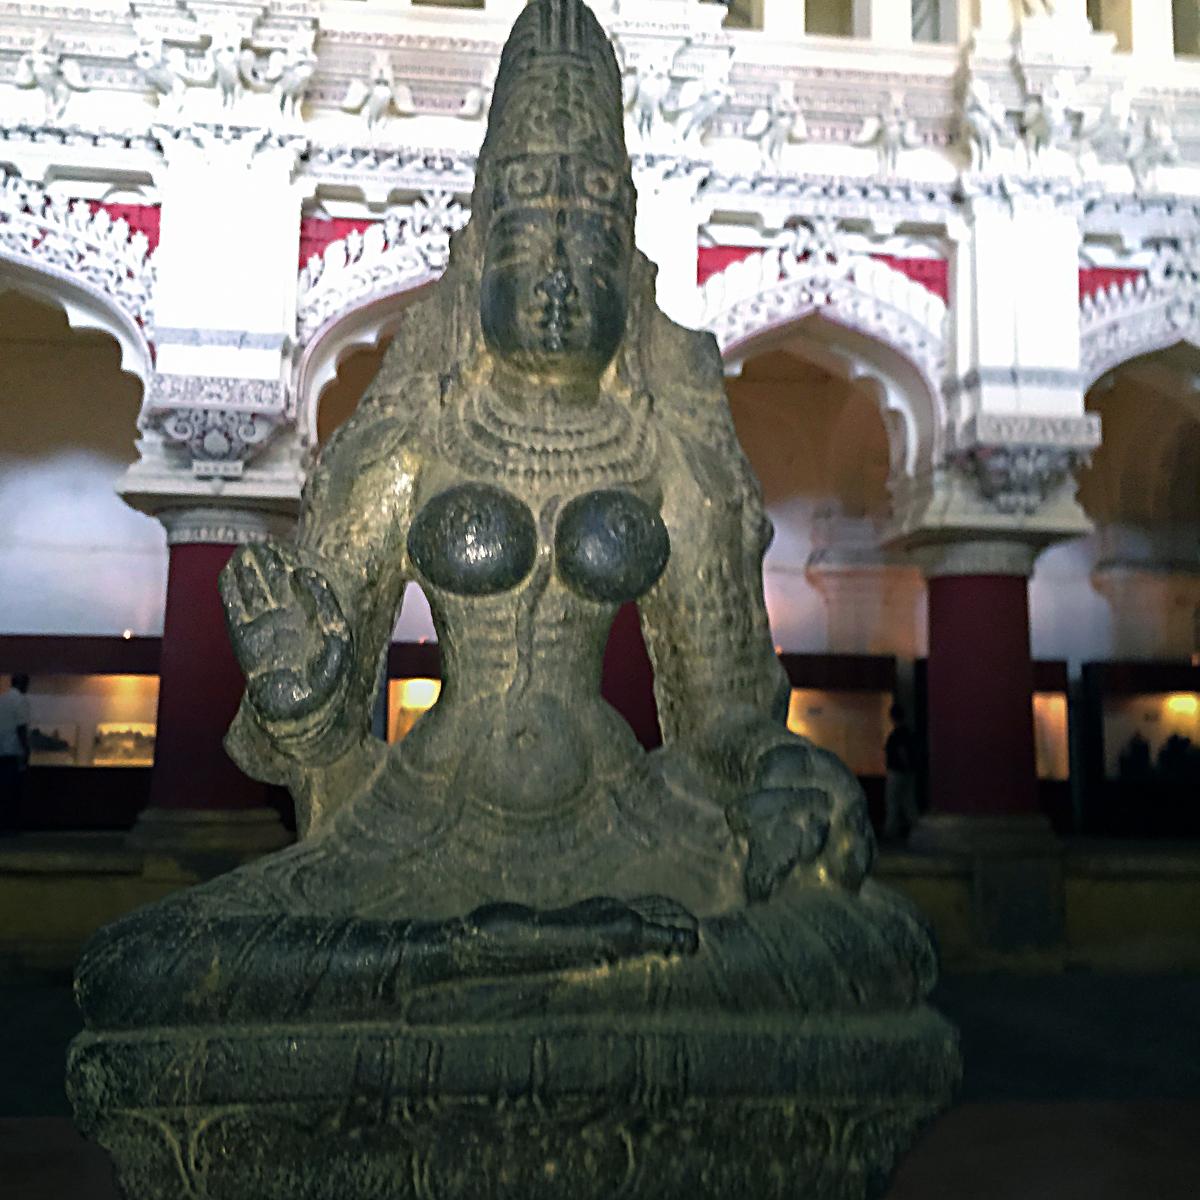 INDIEN Chennai Kanchipuram Tempel Menschen Tempel FINEST-onTour 2151.jpg